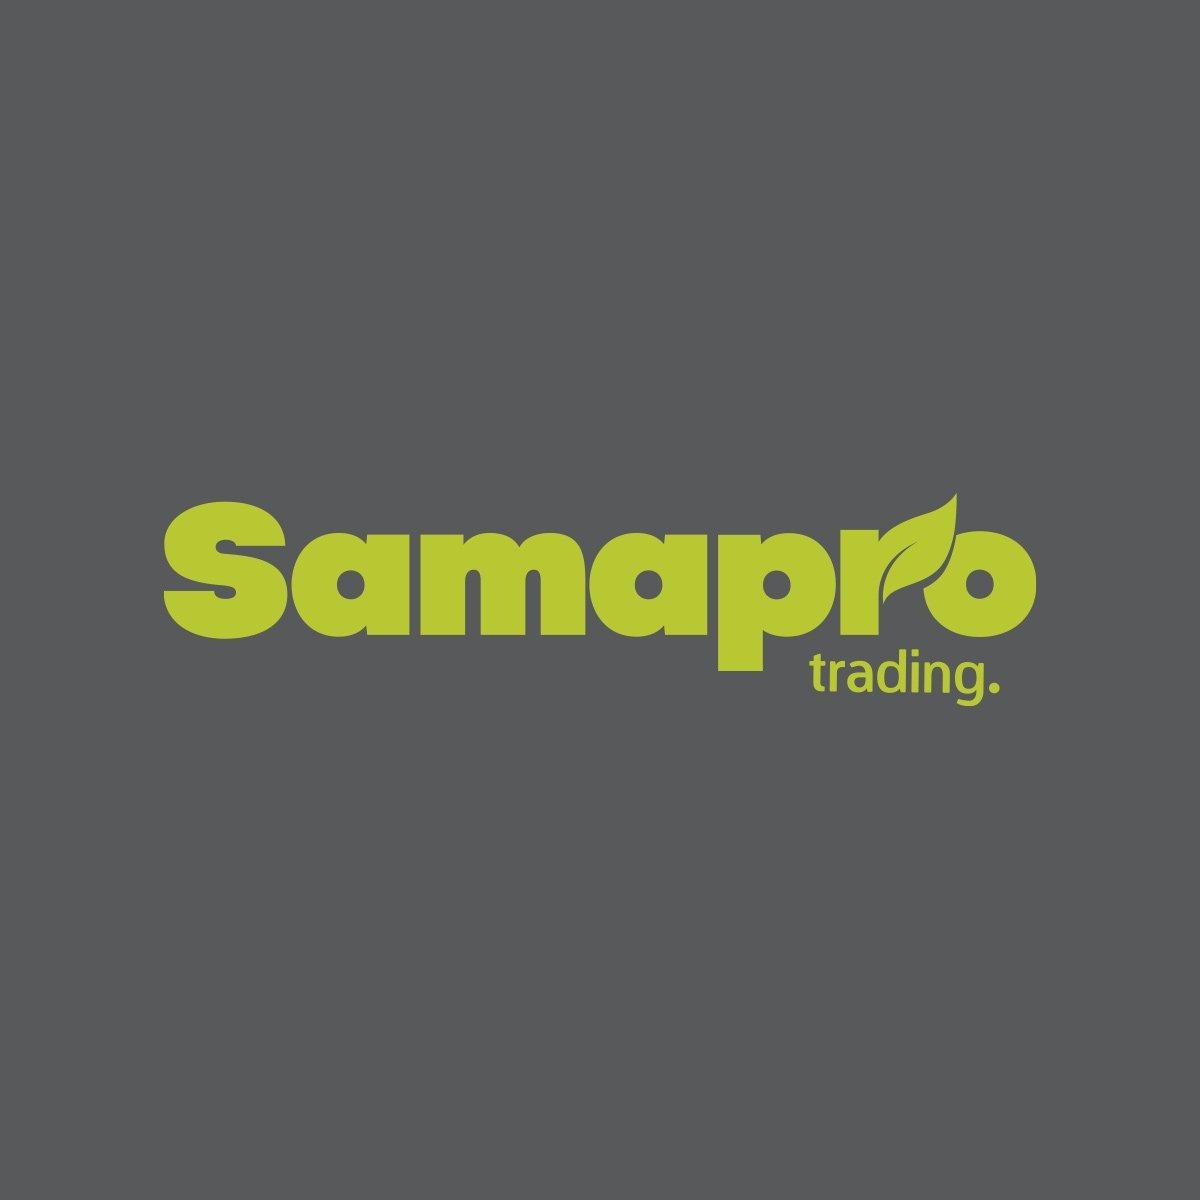 Samapro Logo